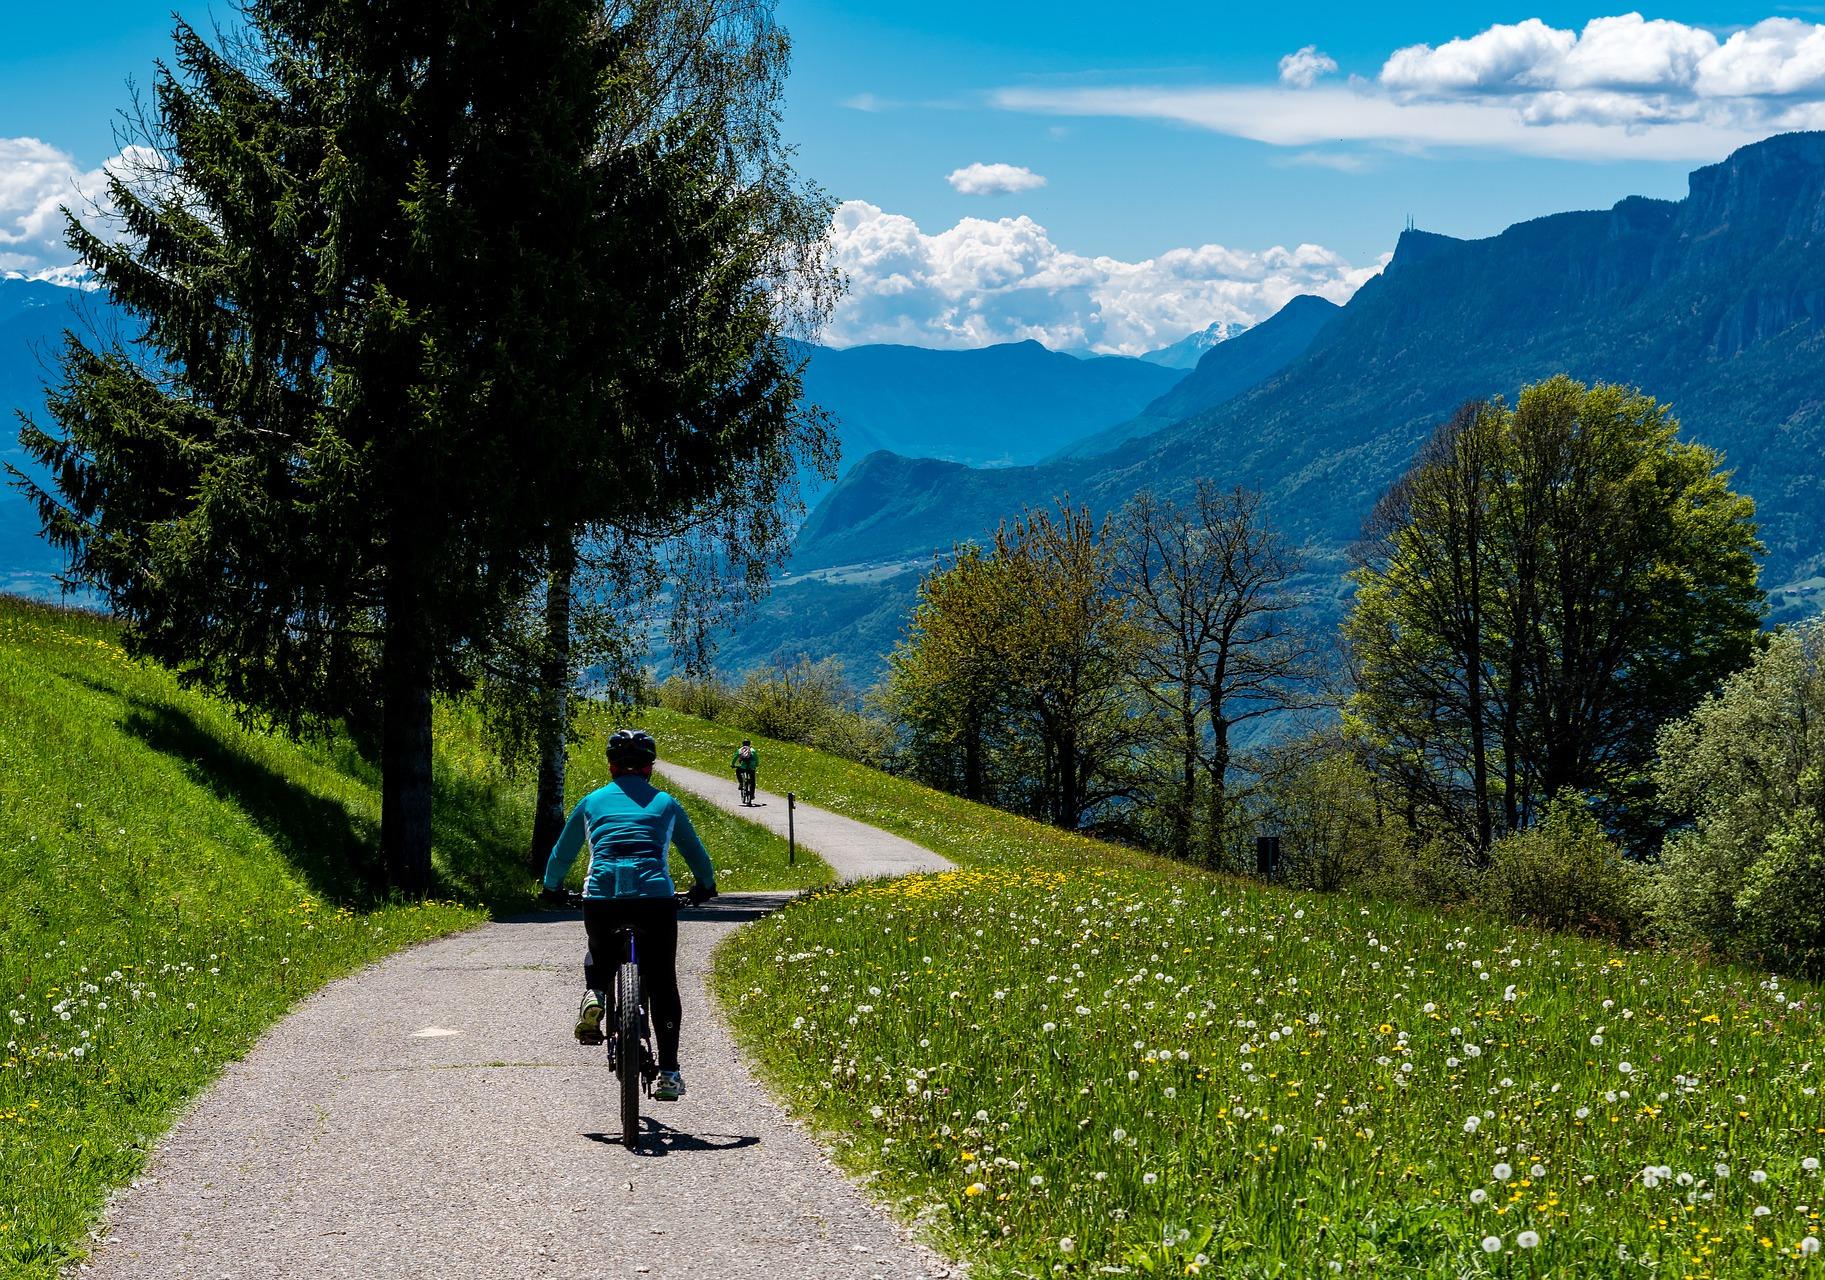 Usare la mountain bike su strada